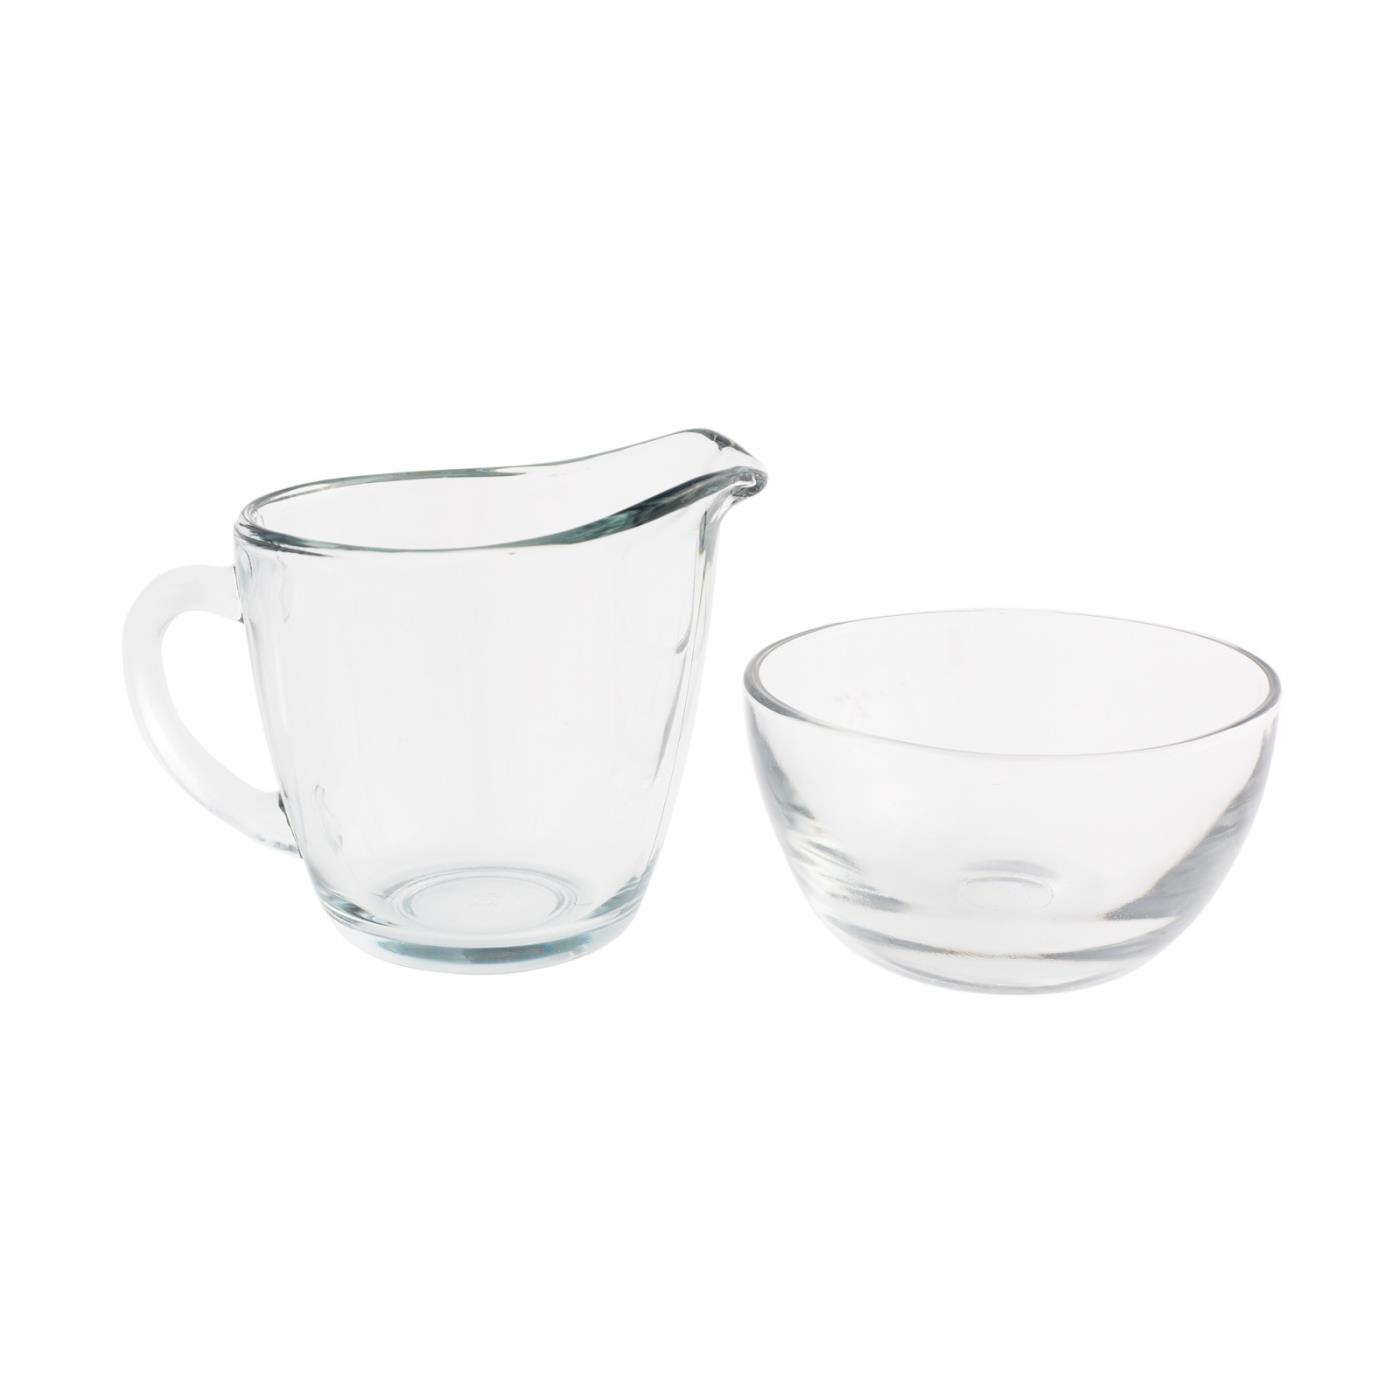 Sugar & Creamer Set - Glass